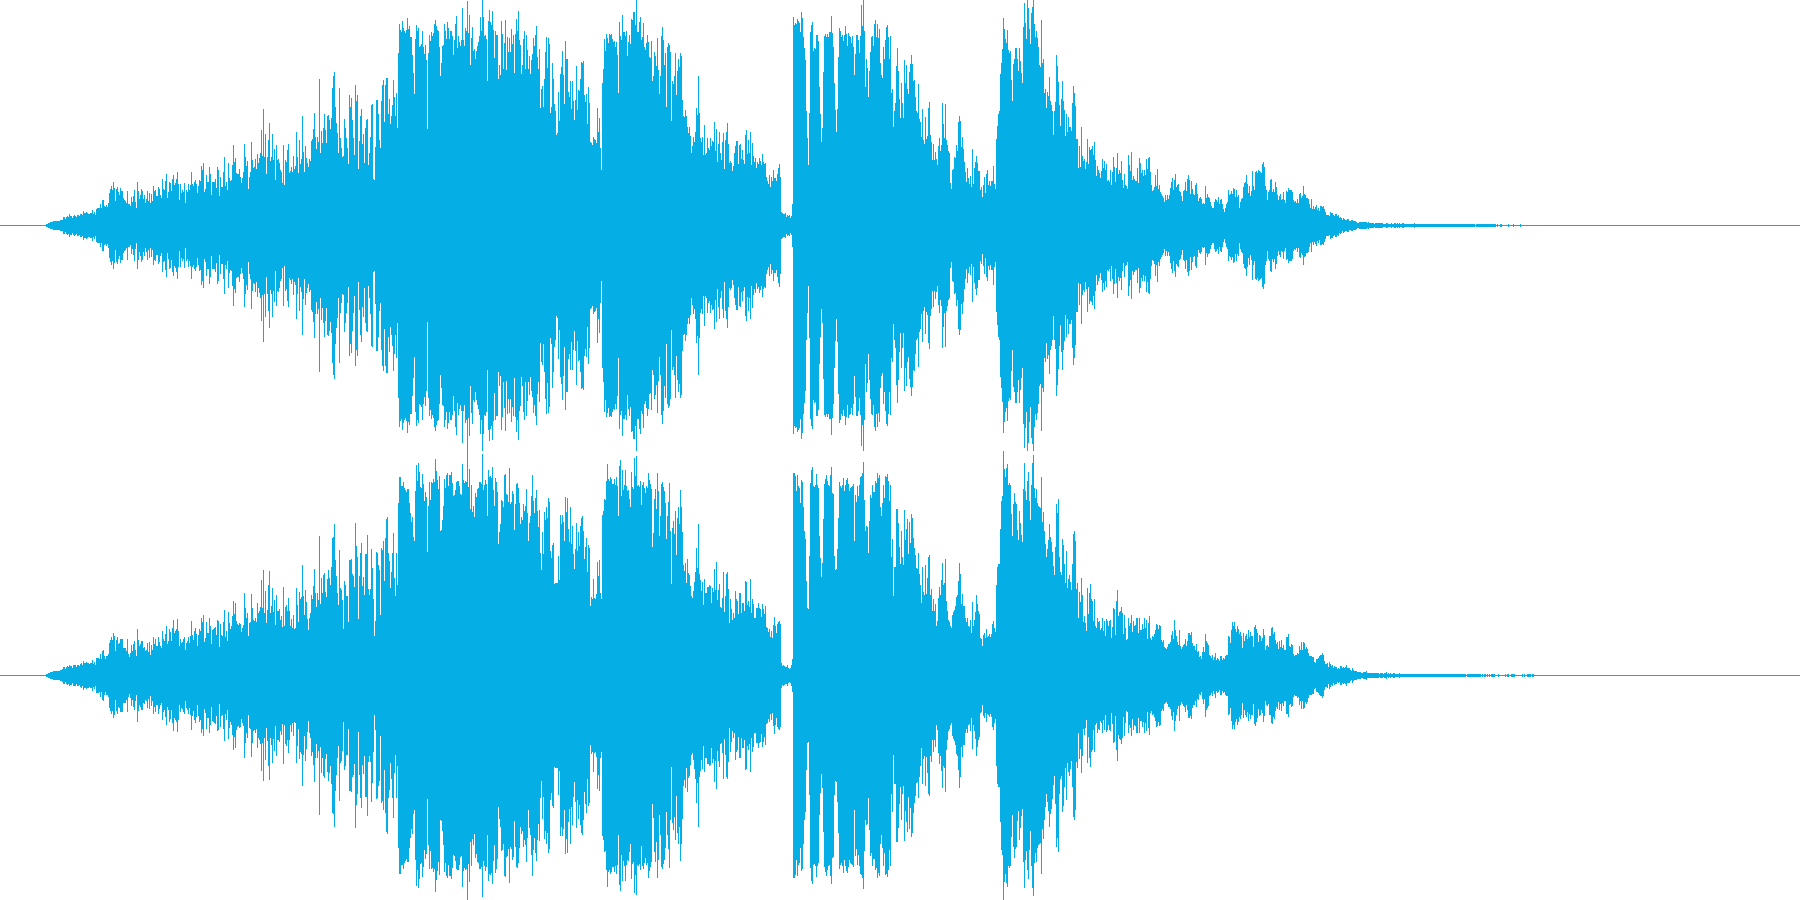 【SE】回復 ヒーリング キュア 魔法の再生済みの波形